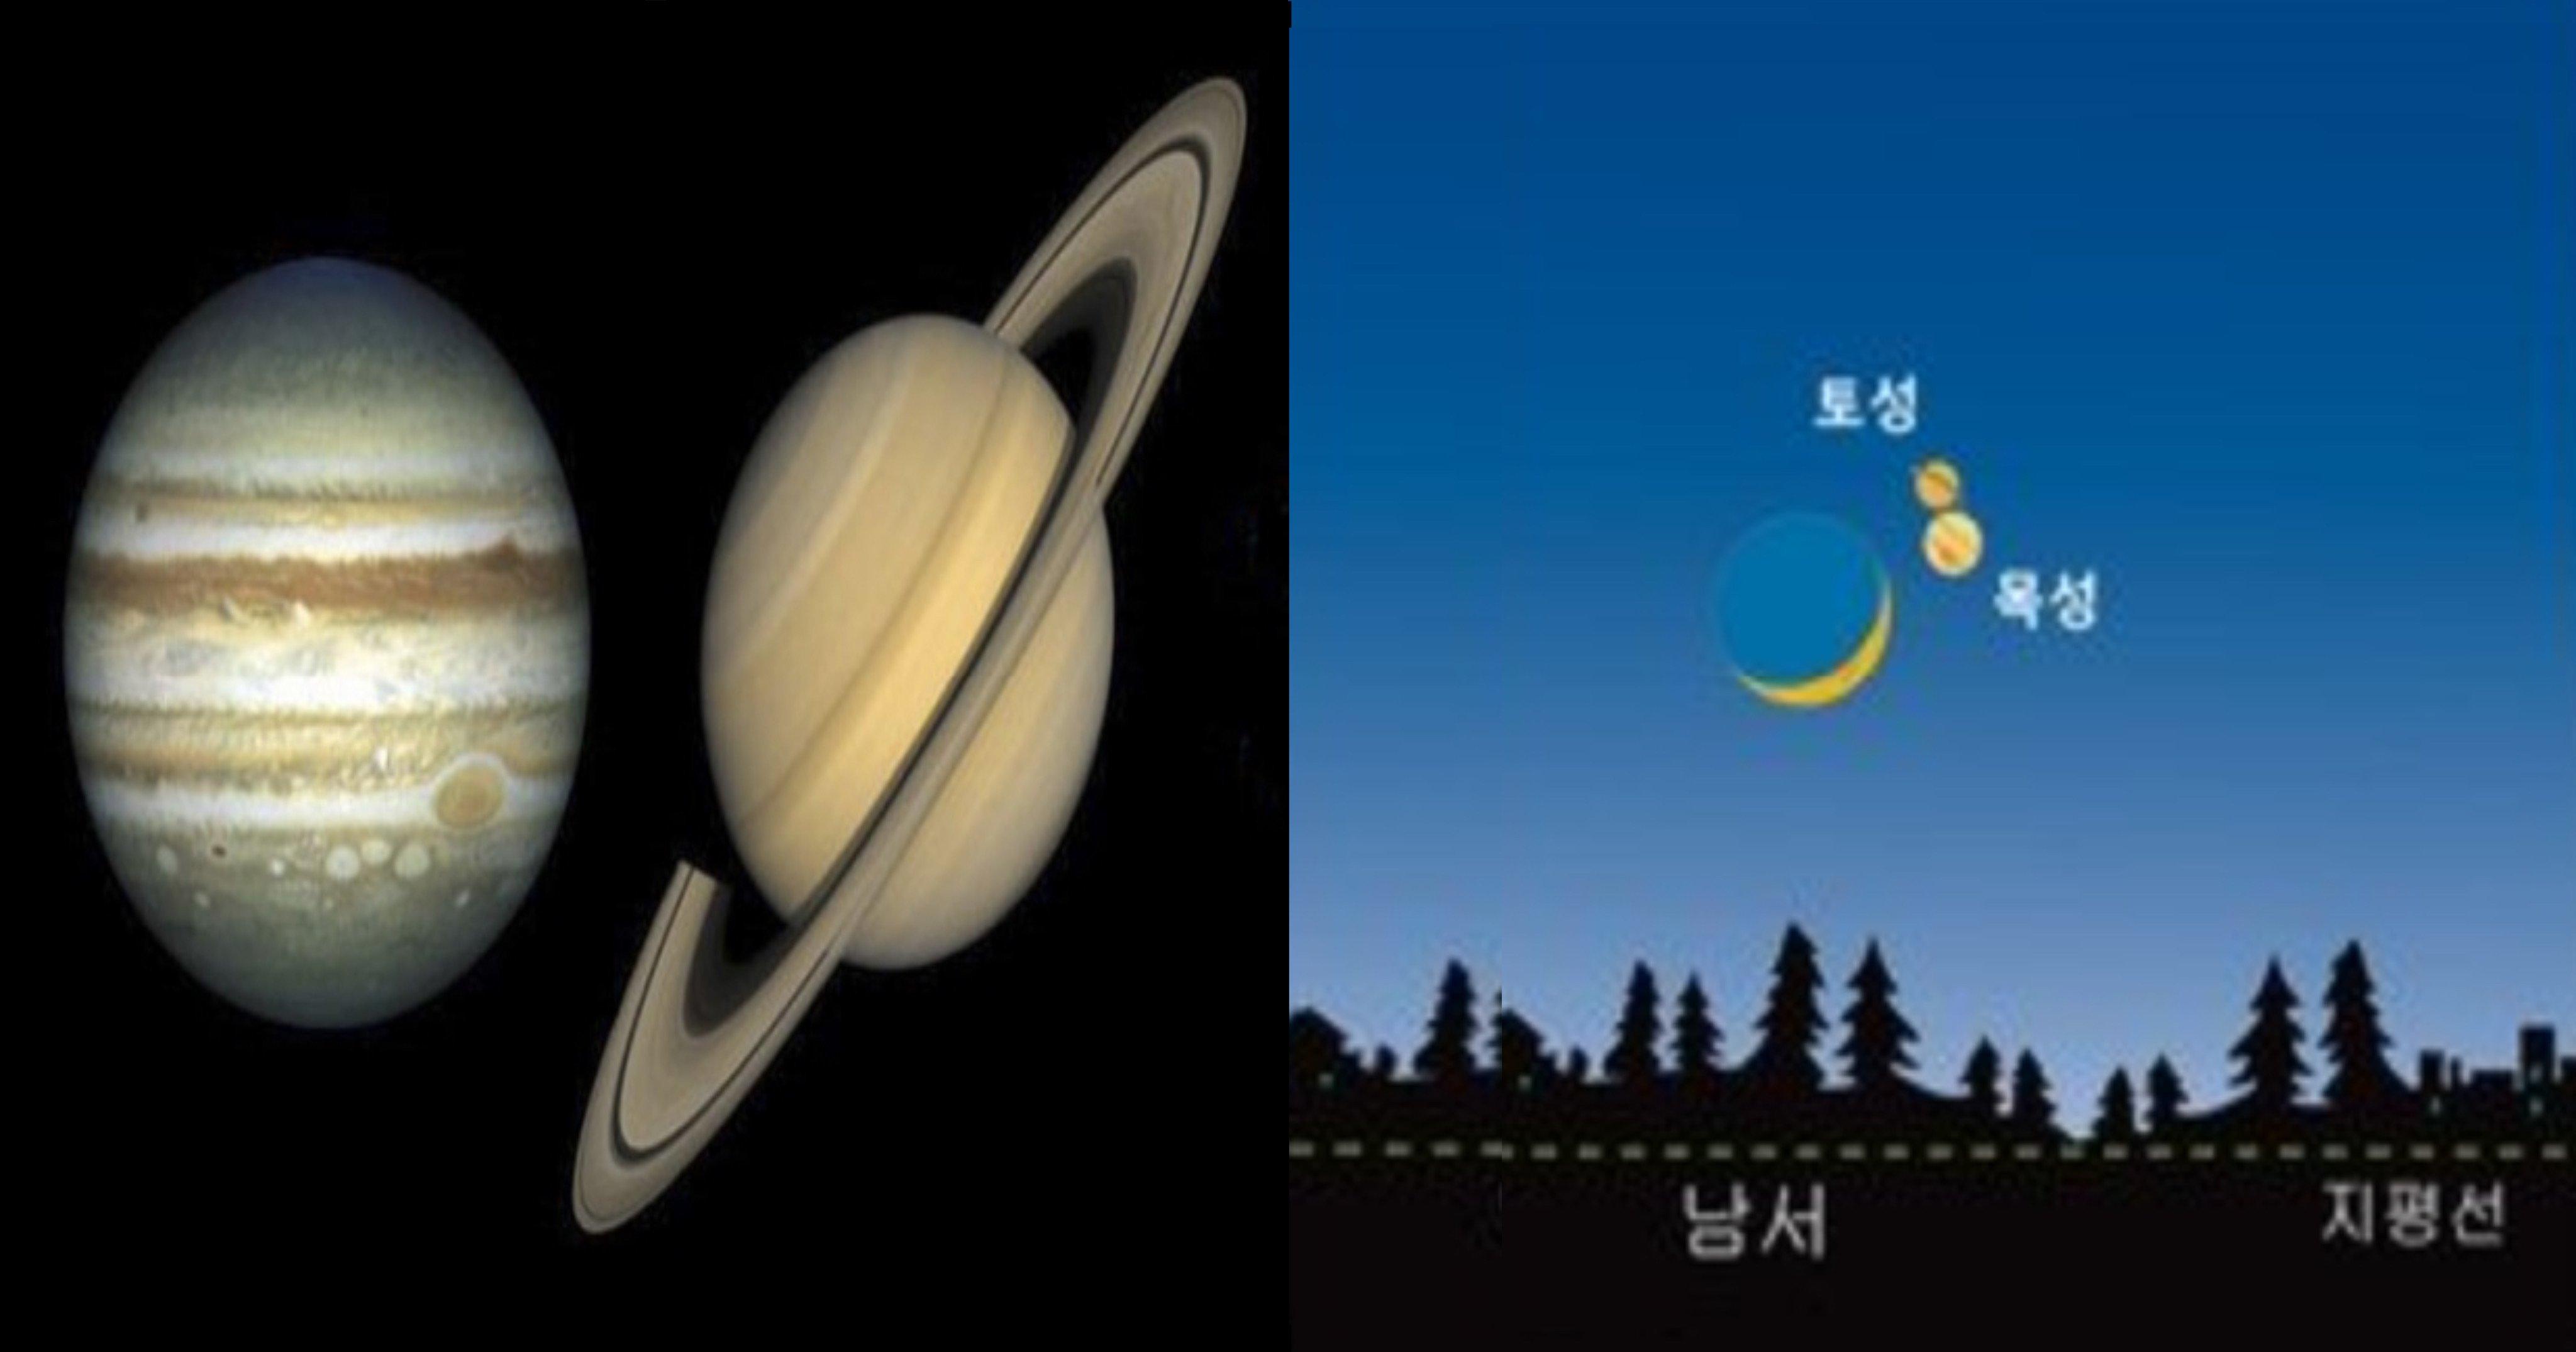 e38587 10.jpg?resize=412,232 - '794년'만의 하늘이 주신 이벤트 '우주 쇼'를 맨눈으로 볼 수 있다